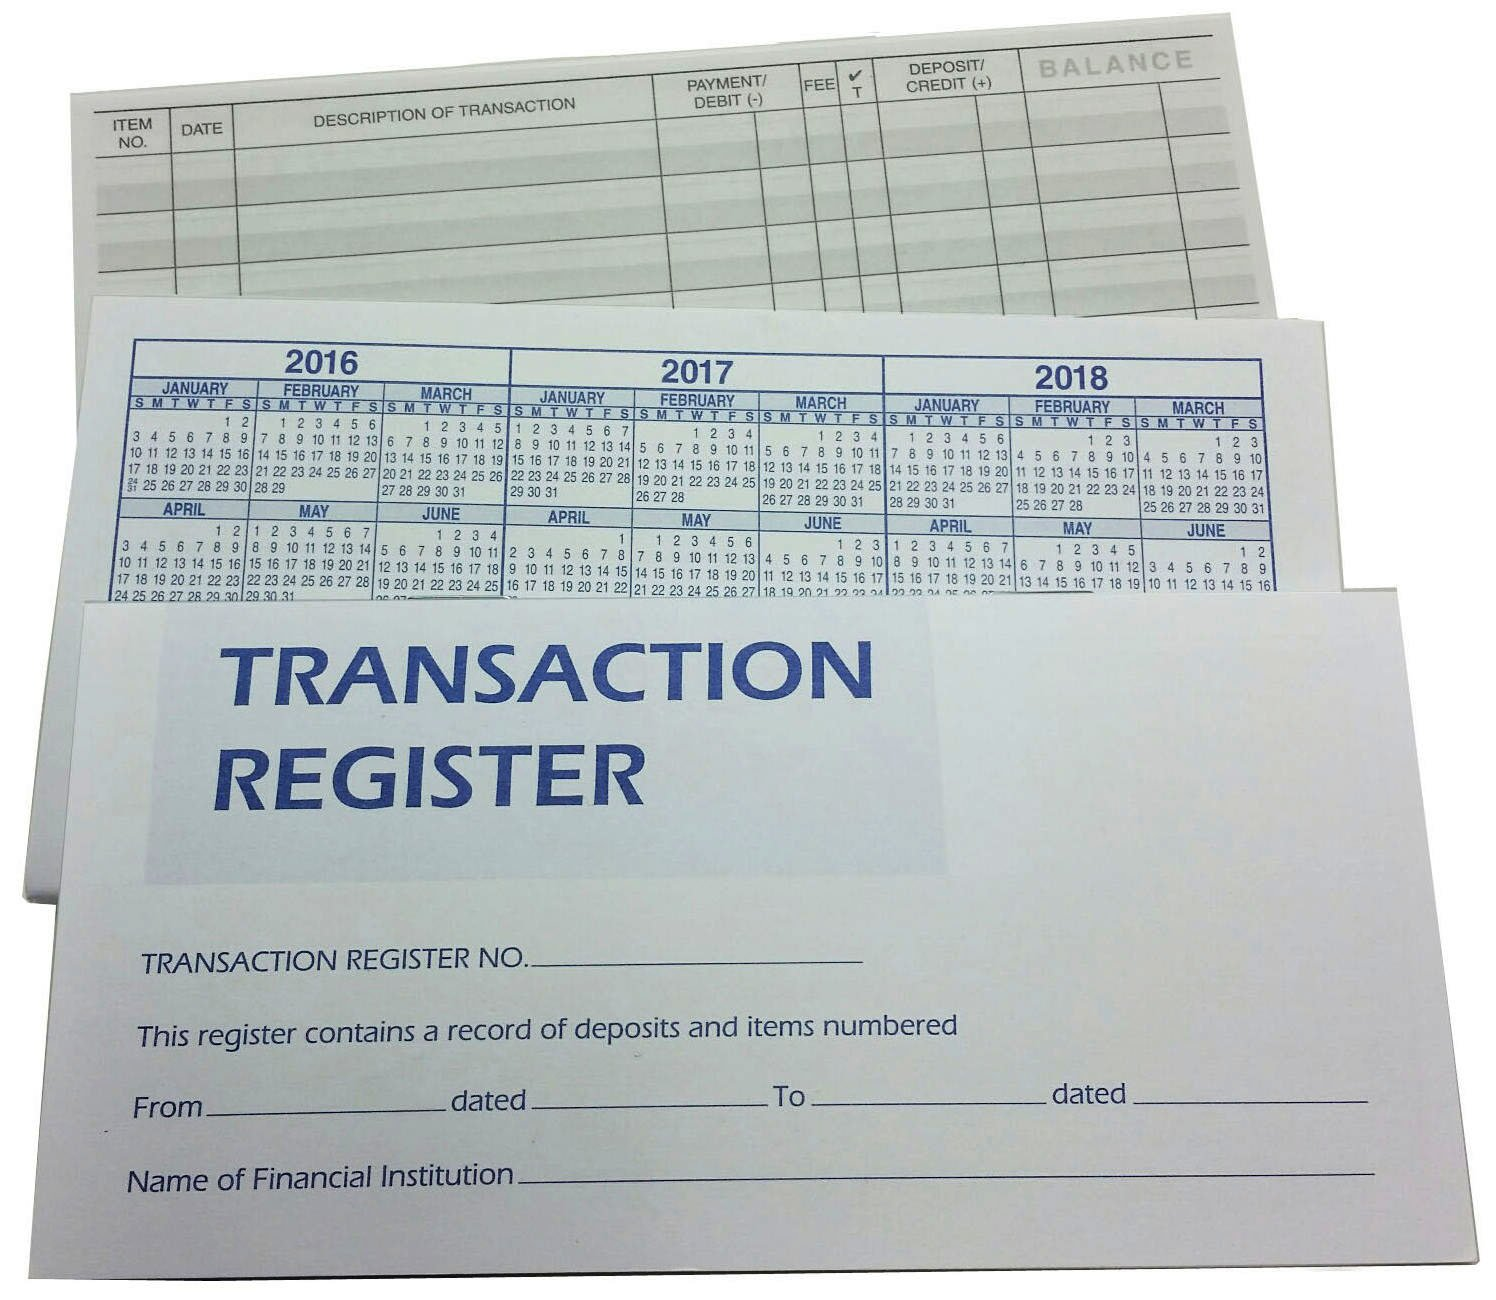 Beach Checkbook//Debit Holder with Check Register /& Debit Photo Insert